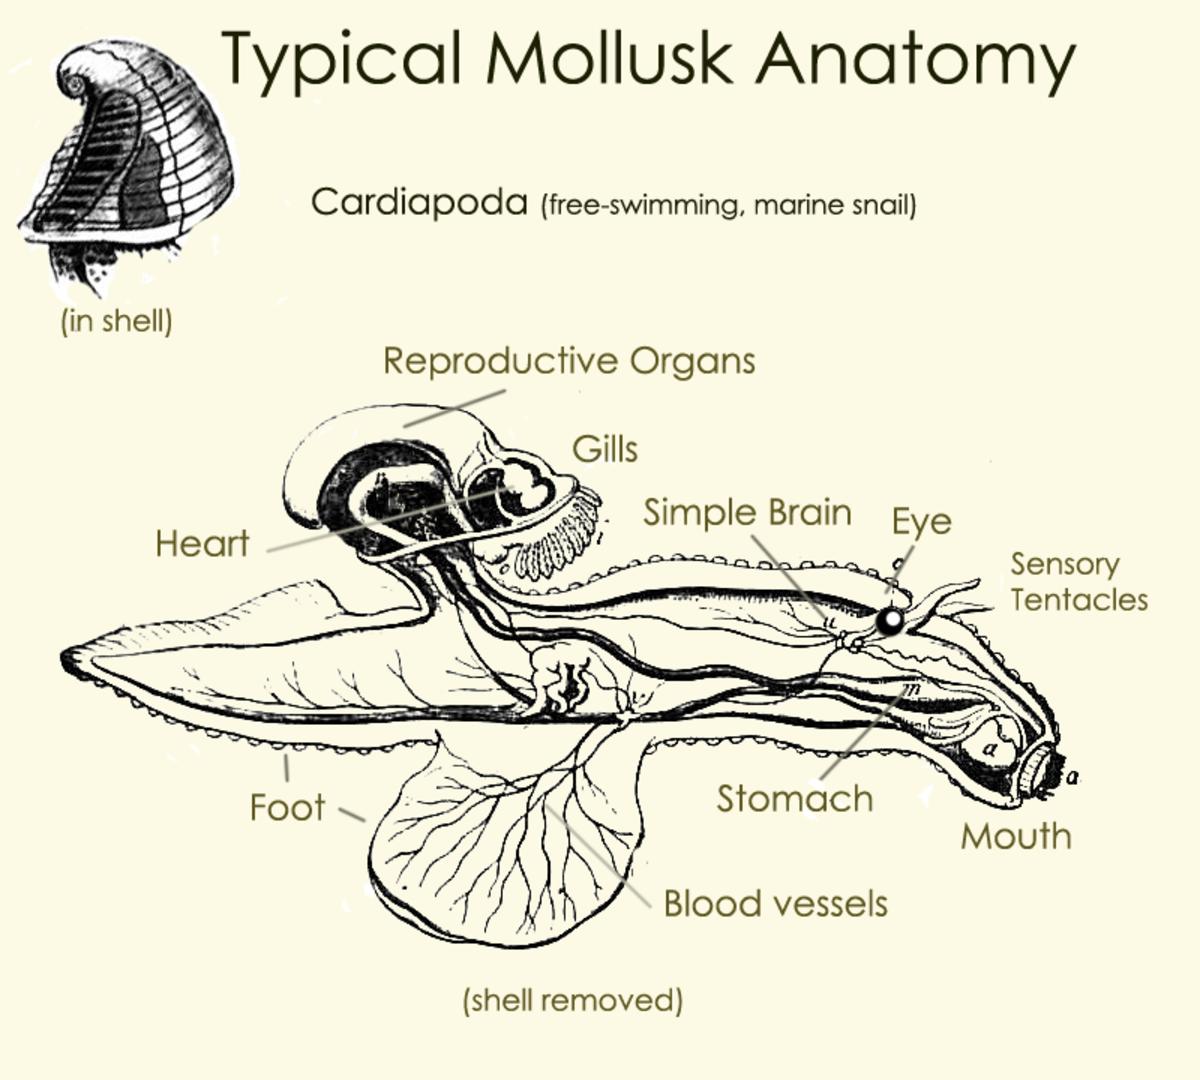 Typical mollusk anatomy